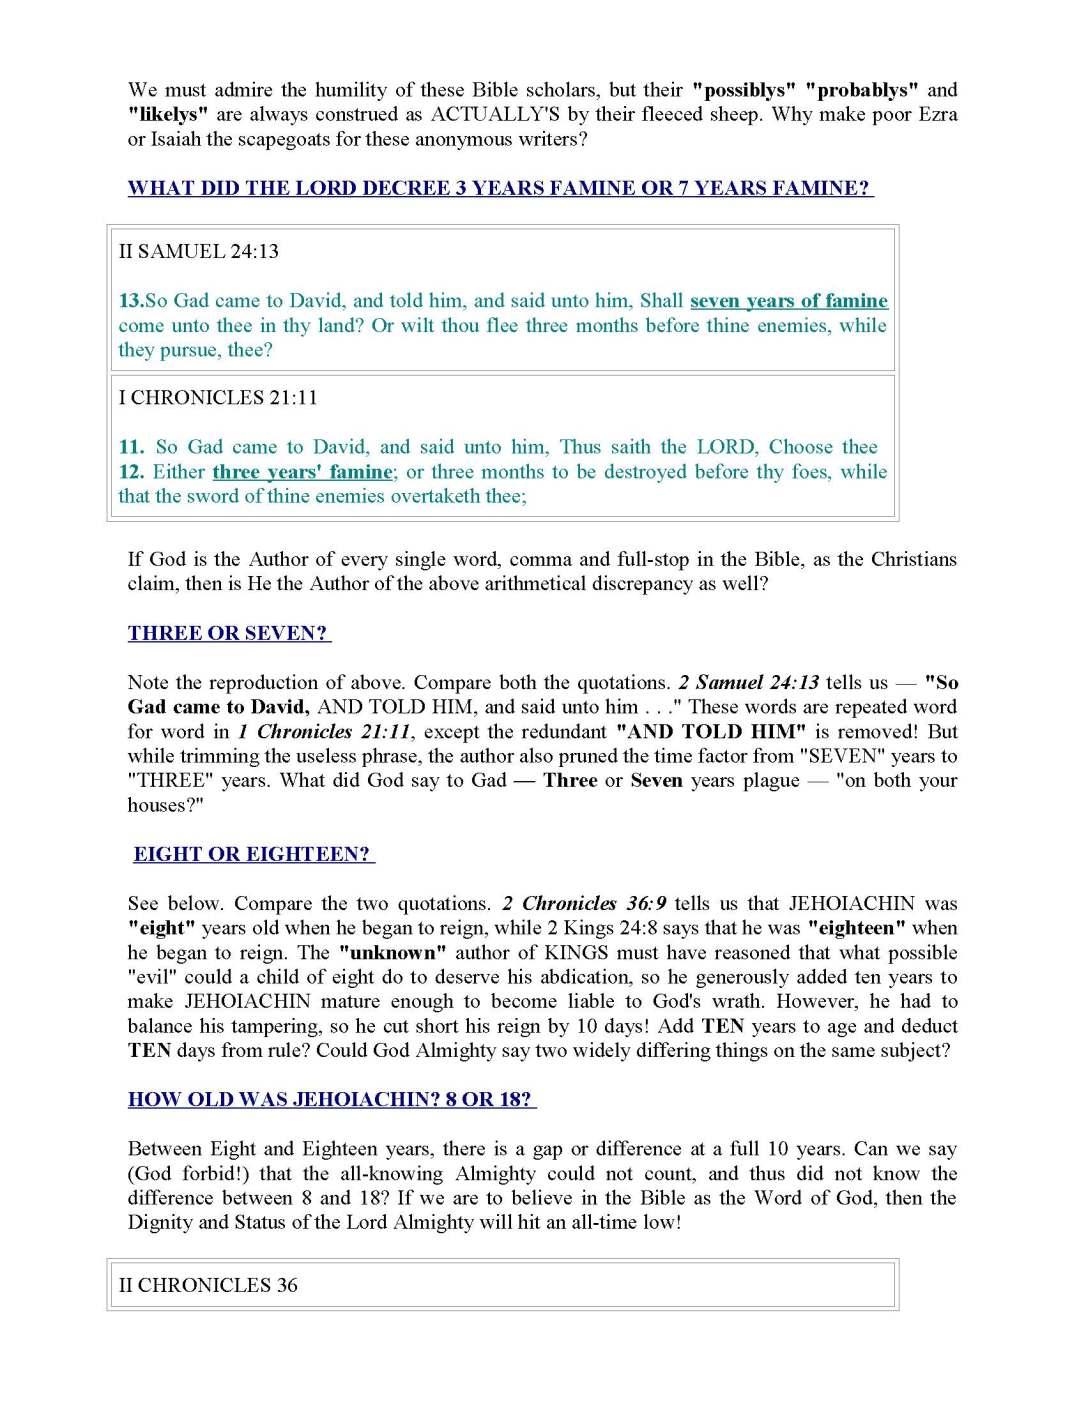 Is The Bible Gods Word [deedat]_Page_28